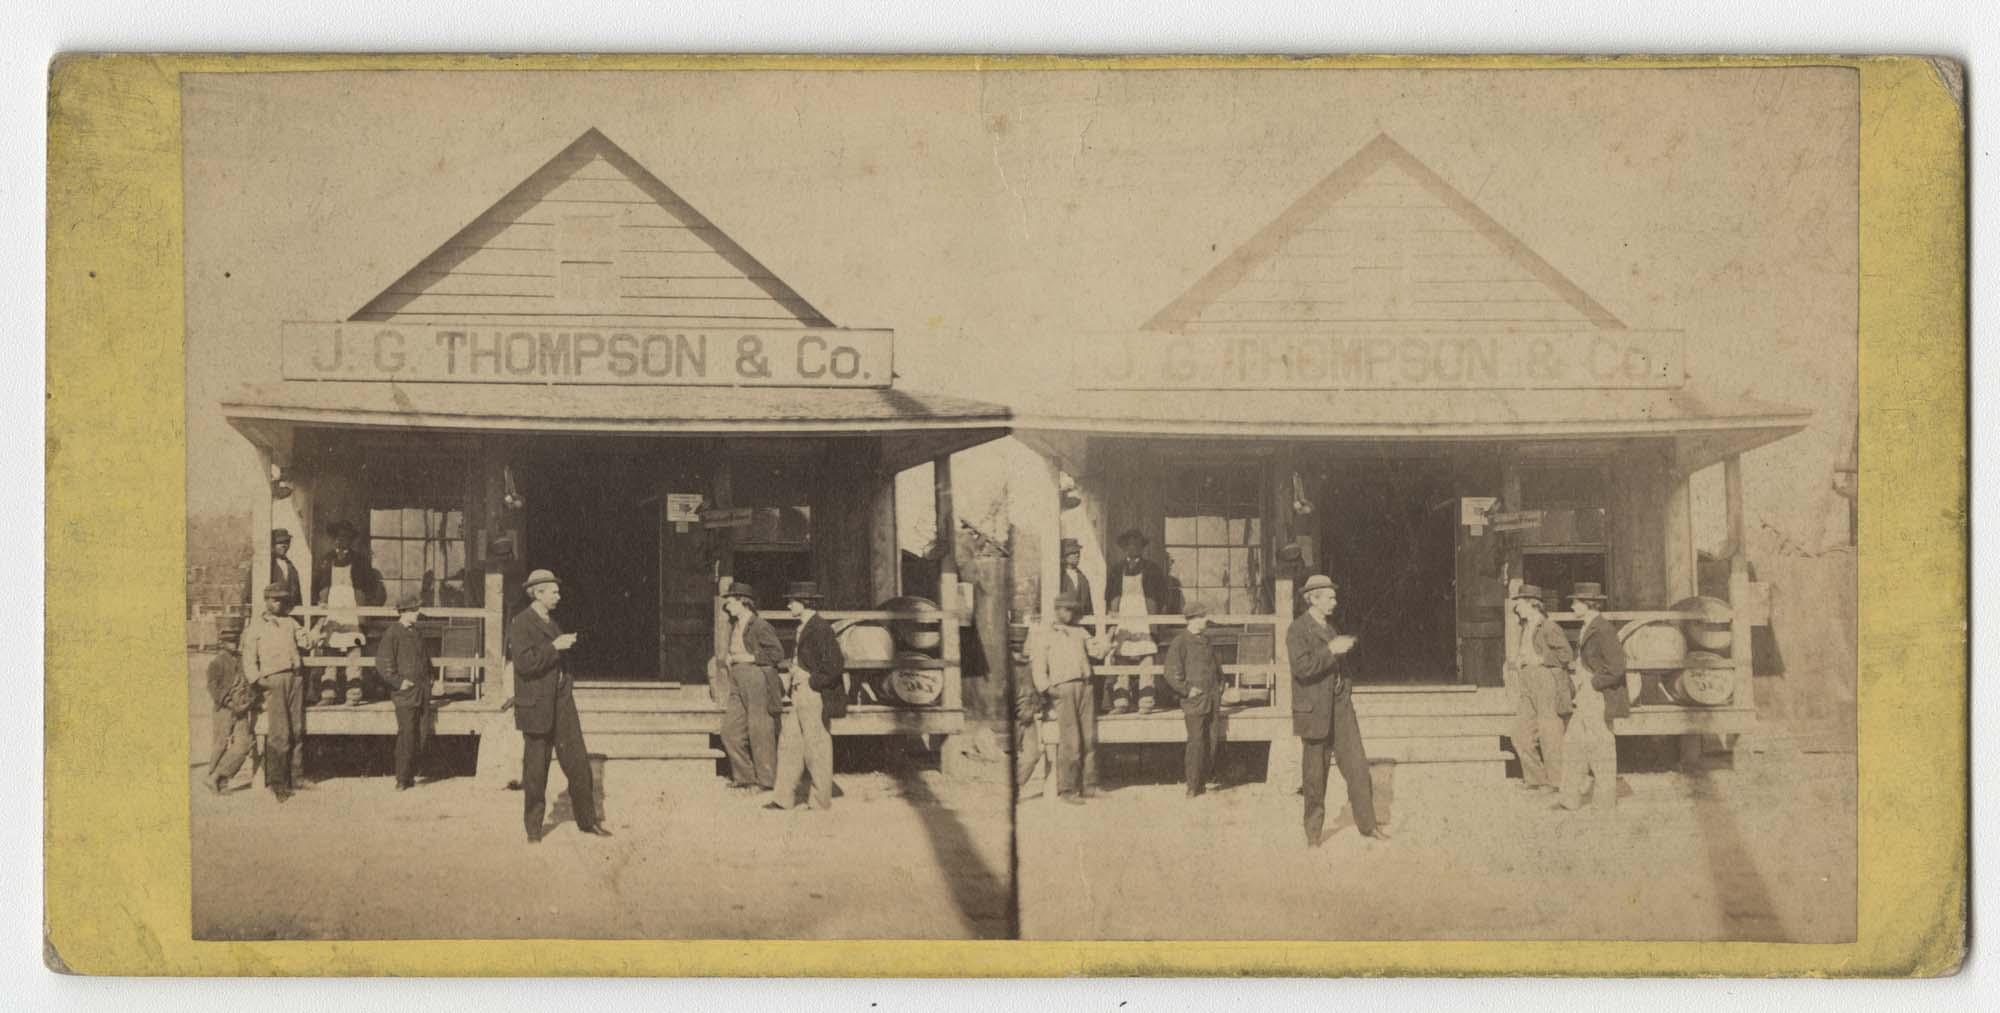 J.G. Thompson & Co.